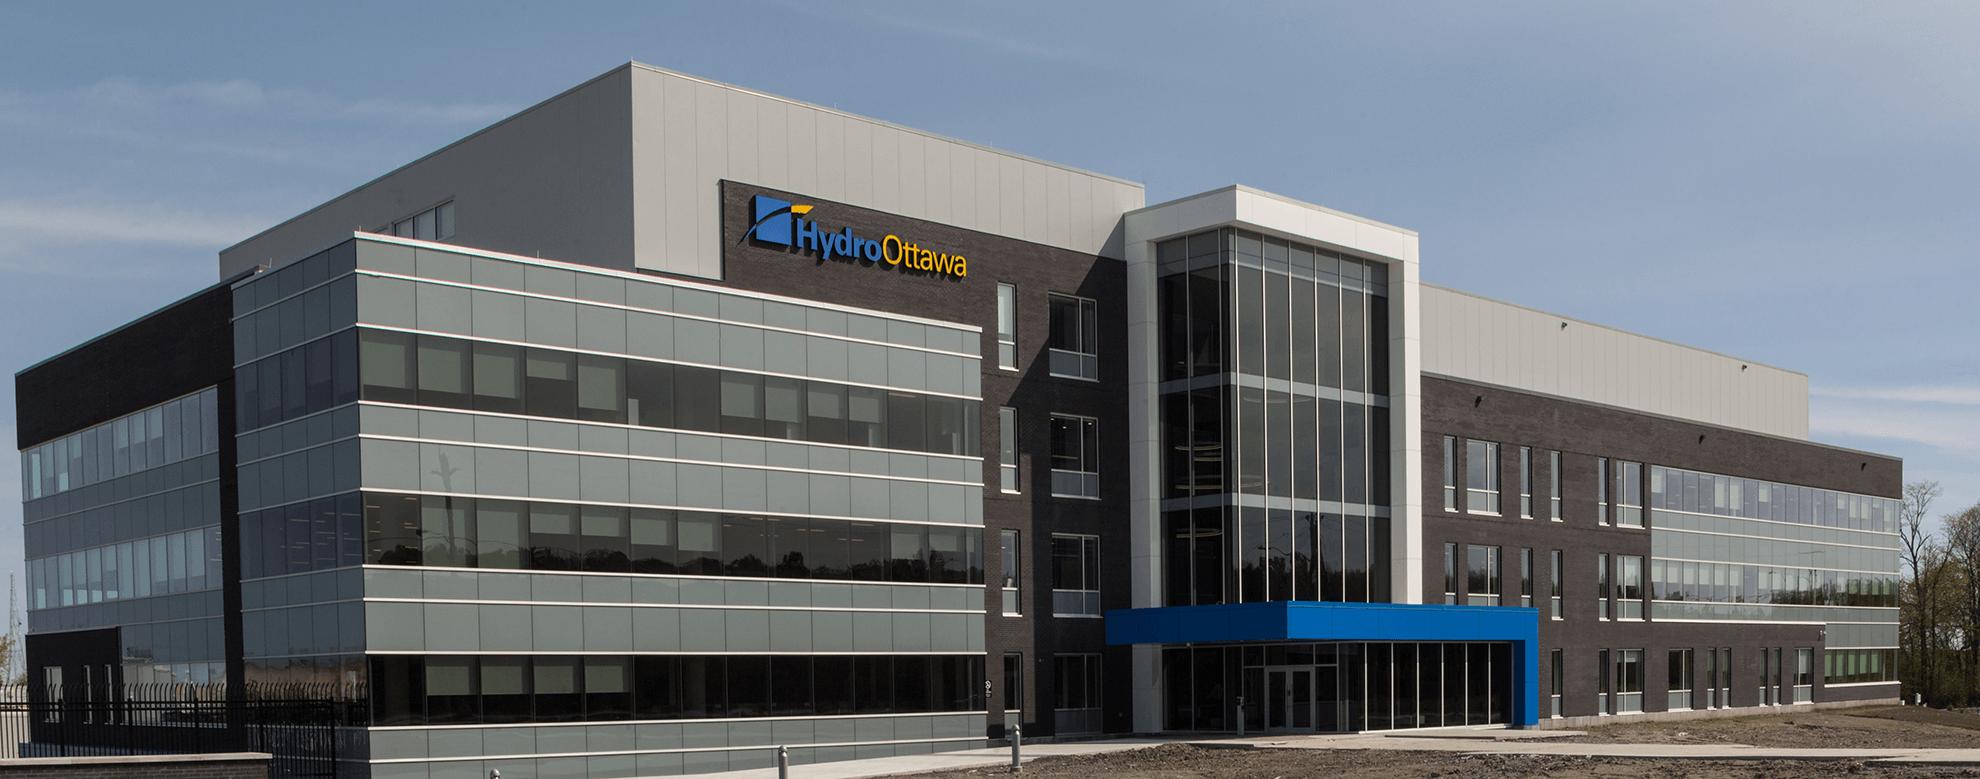 hydro-ottawa-building